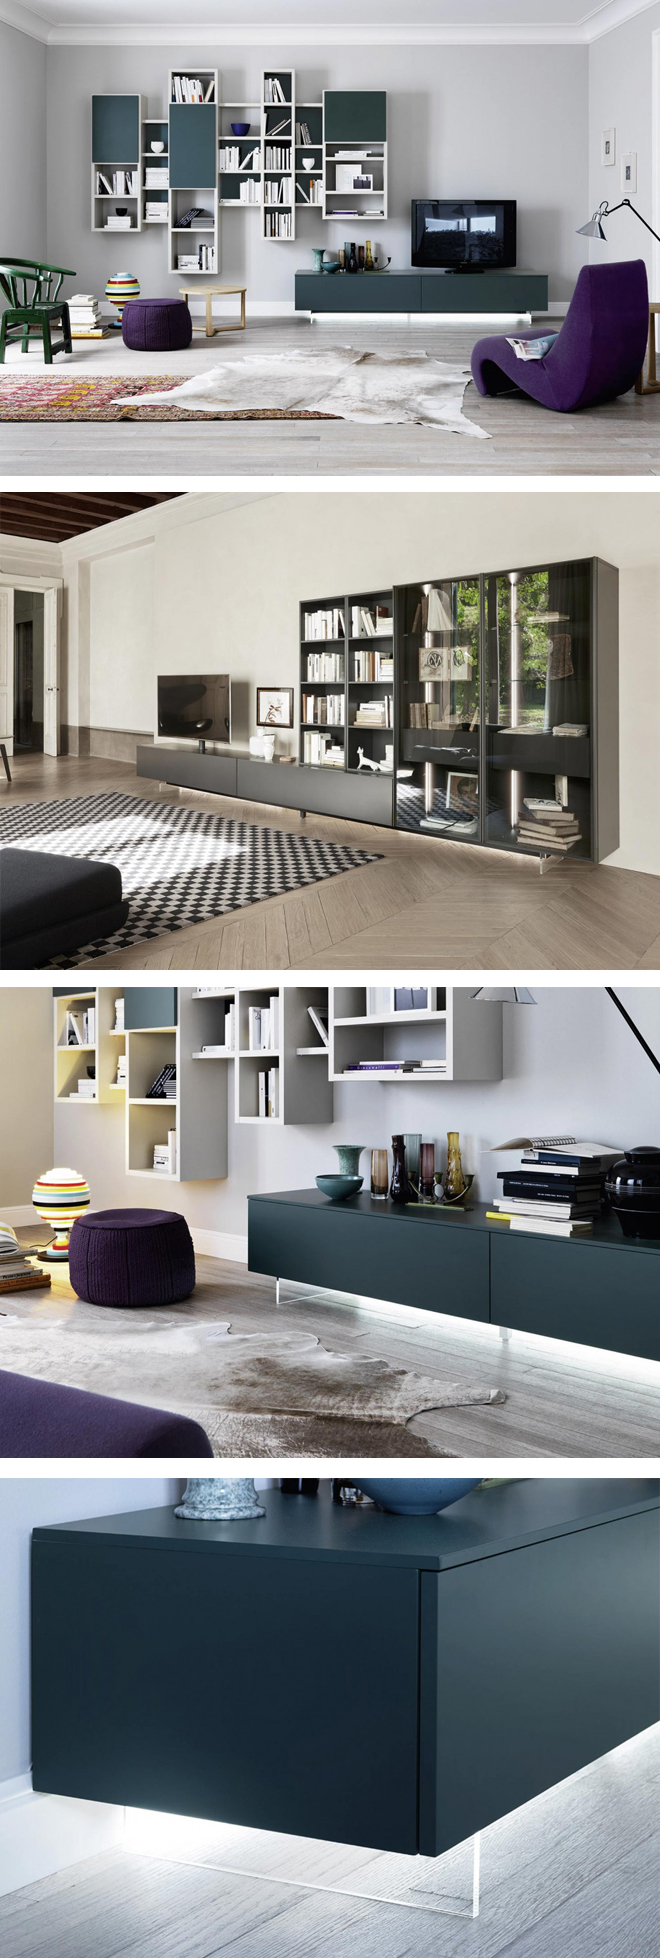 Livitalia Tv Sockel Transparent Tvs Tv Unit And Office Designs # Moderne Table A Tv